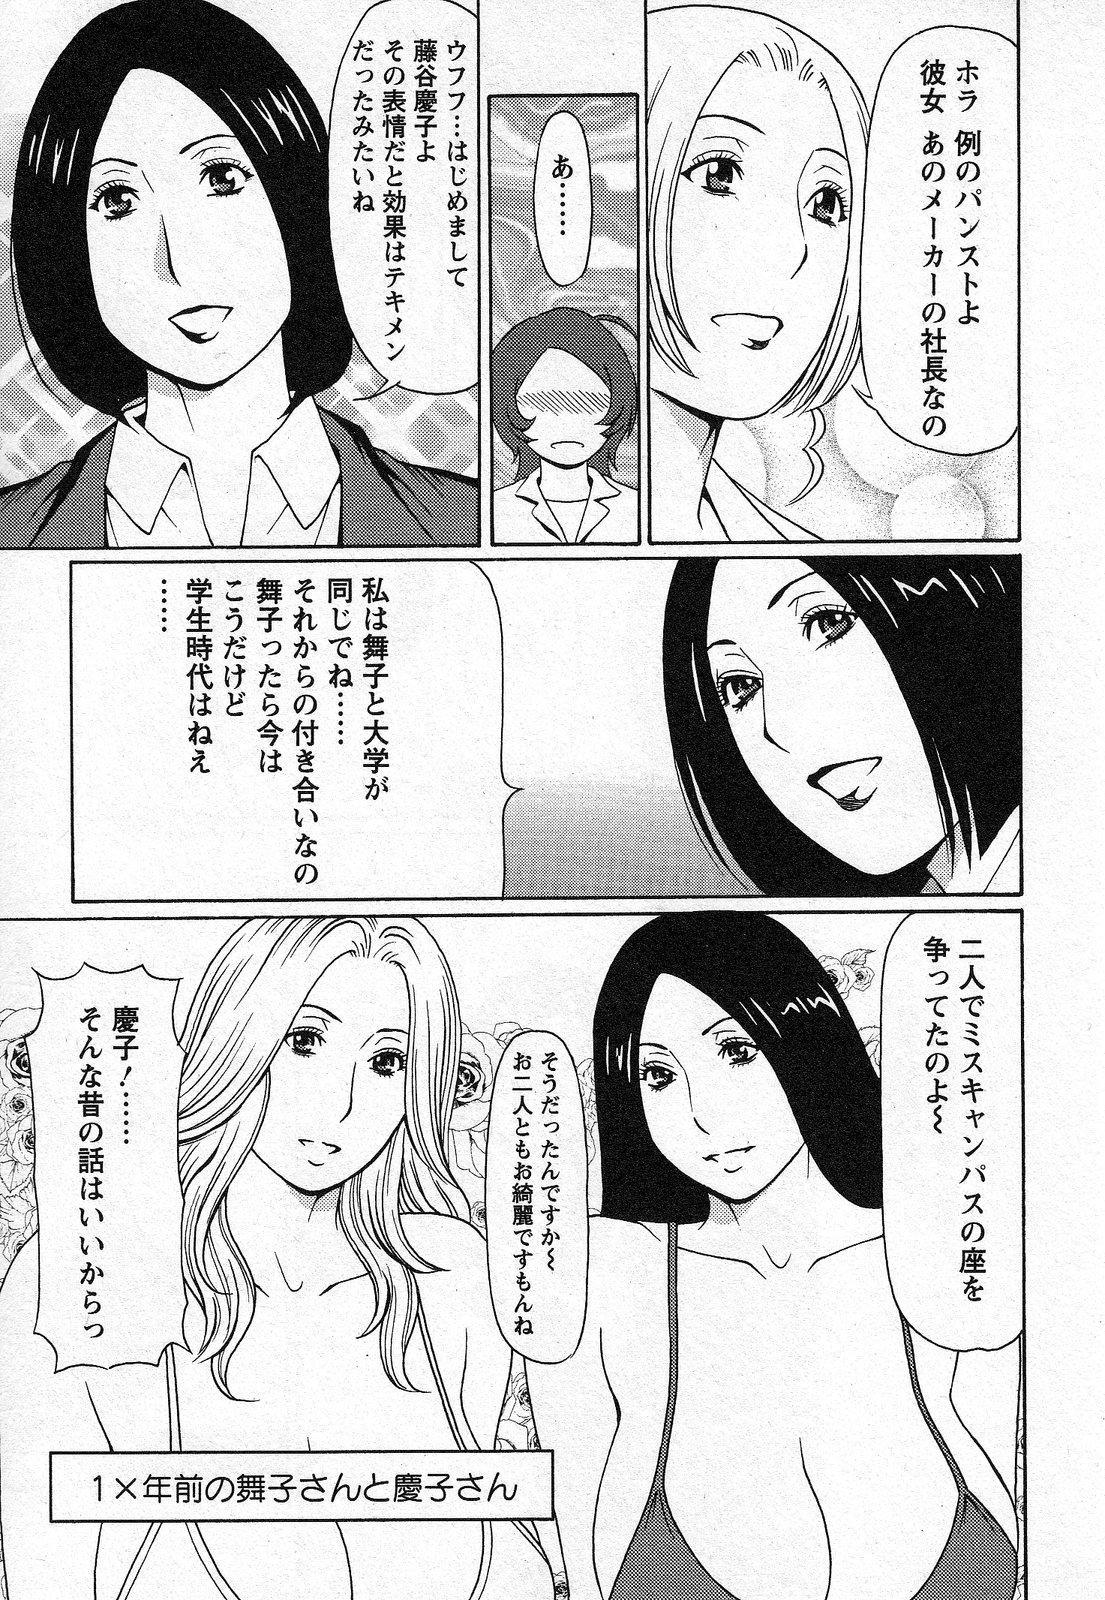 Tenshi ni Omakase 43